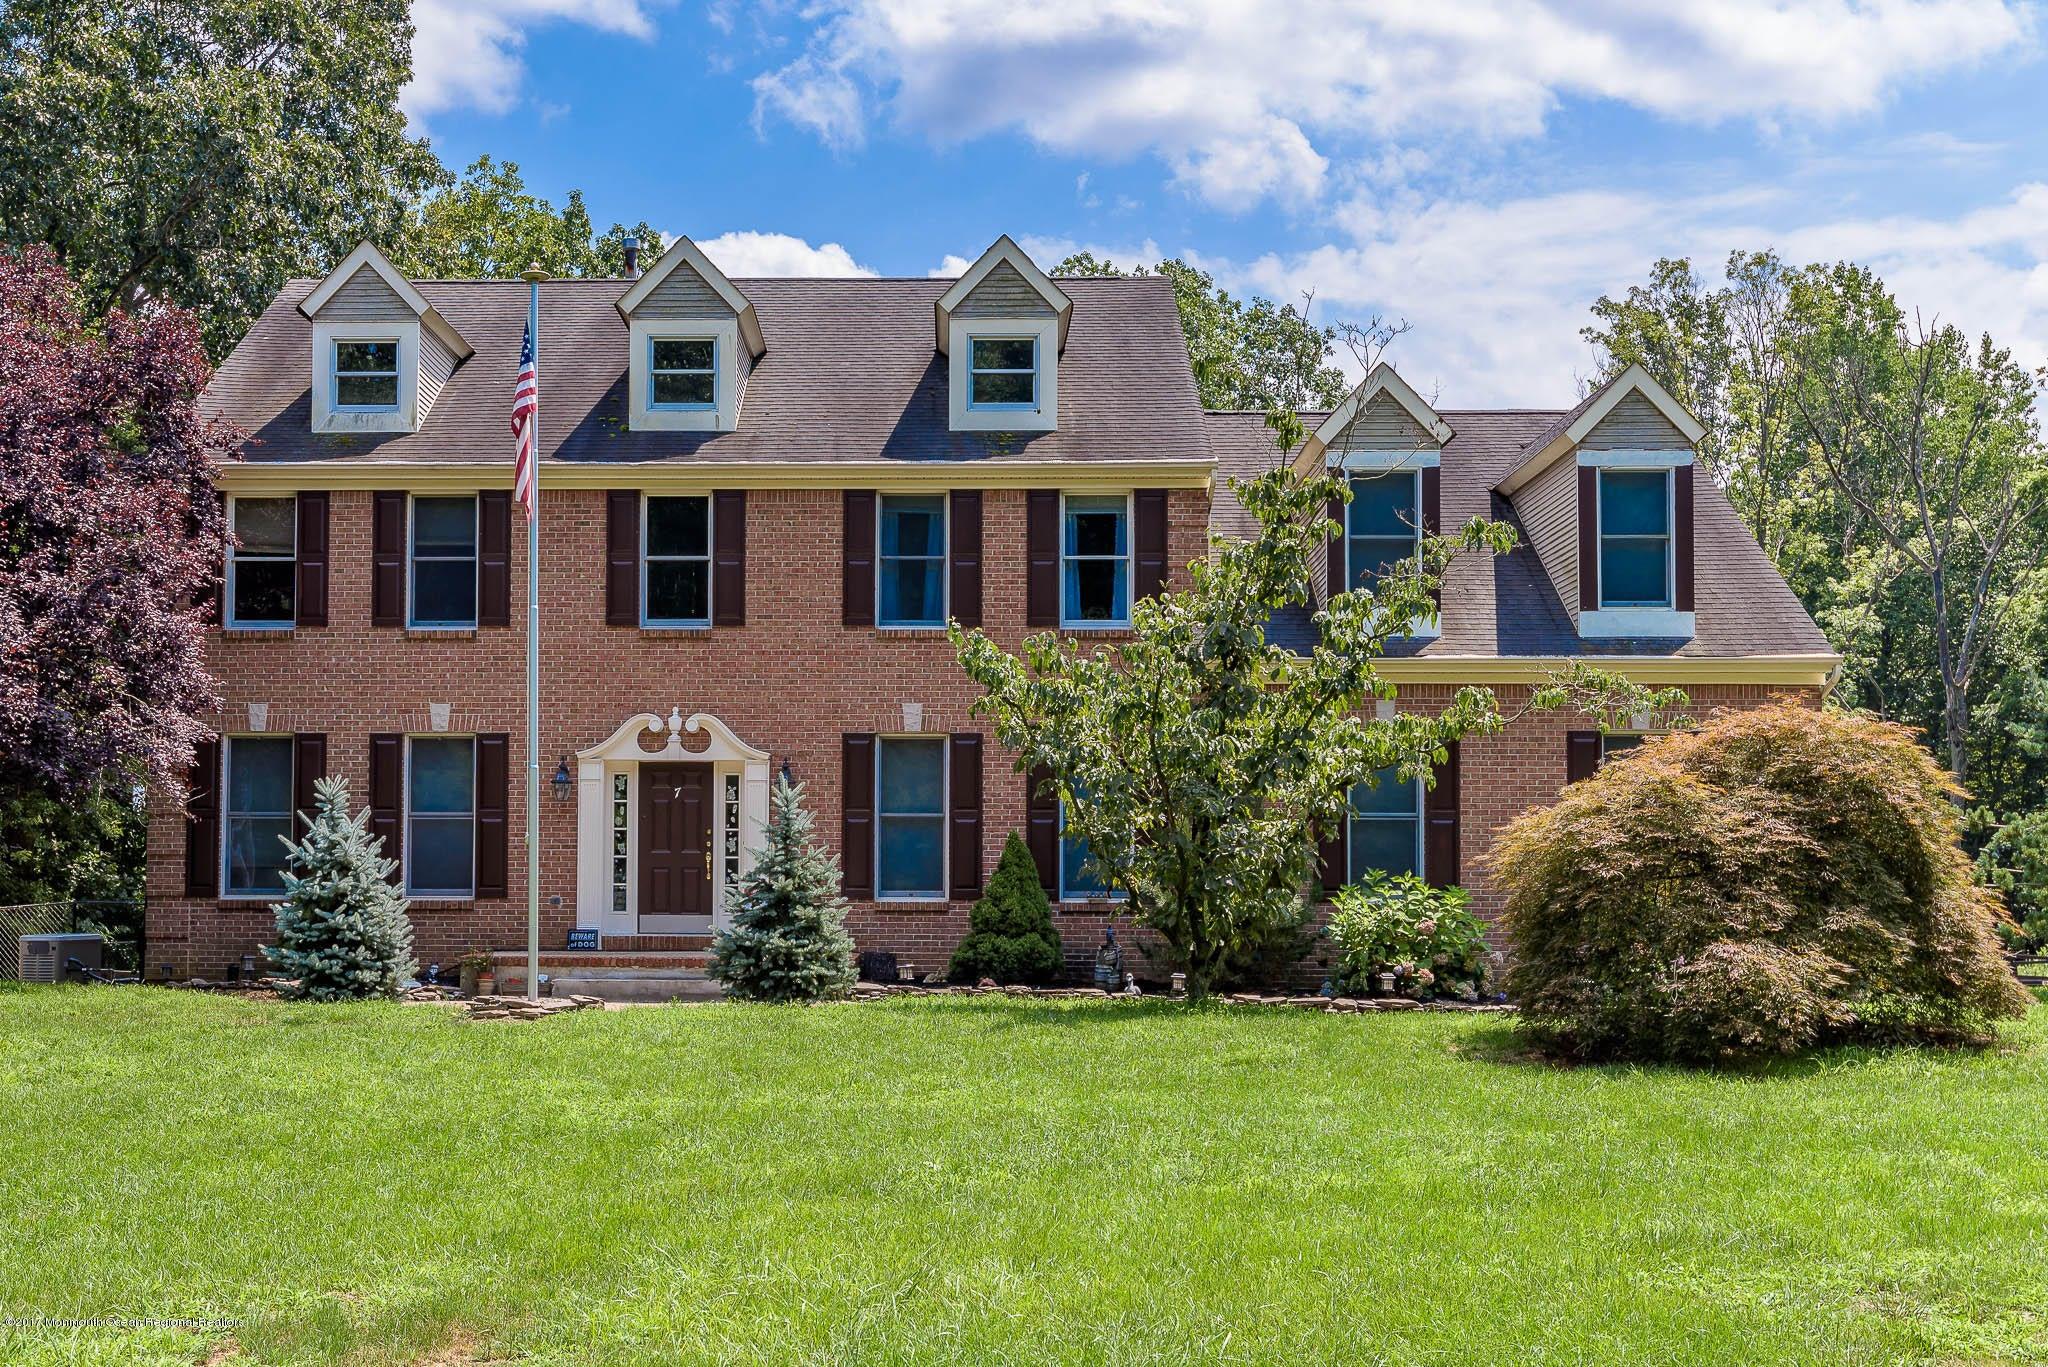 独户住宅 为 销售 在 7 Olde Noah Hunt Road 7 Olde Noah Hunt Road Millstone, 新泽西州 08510 美国